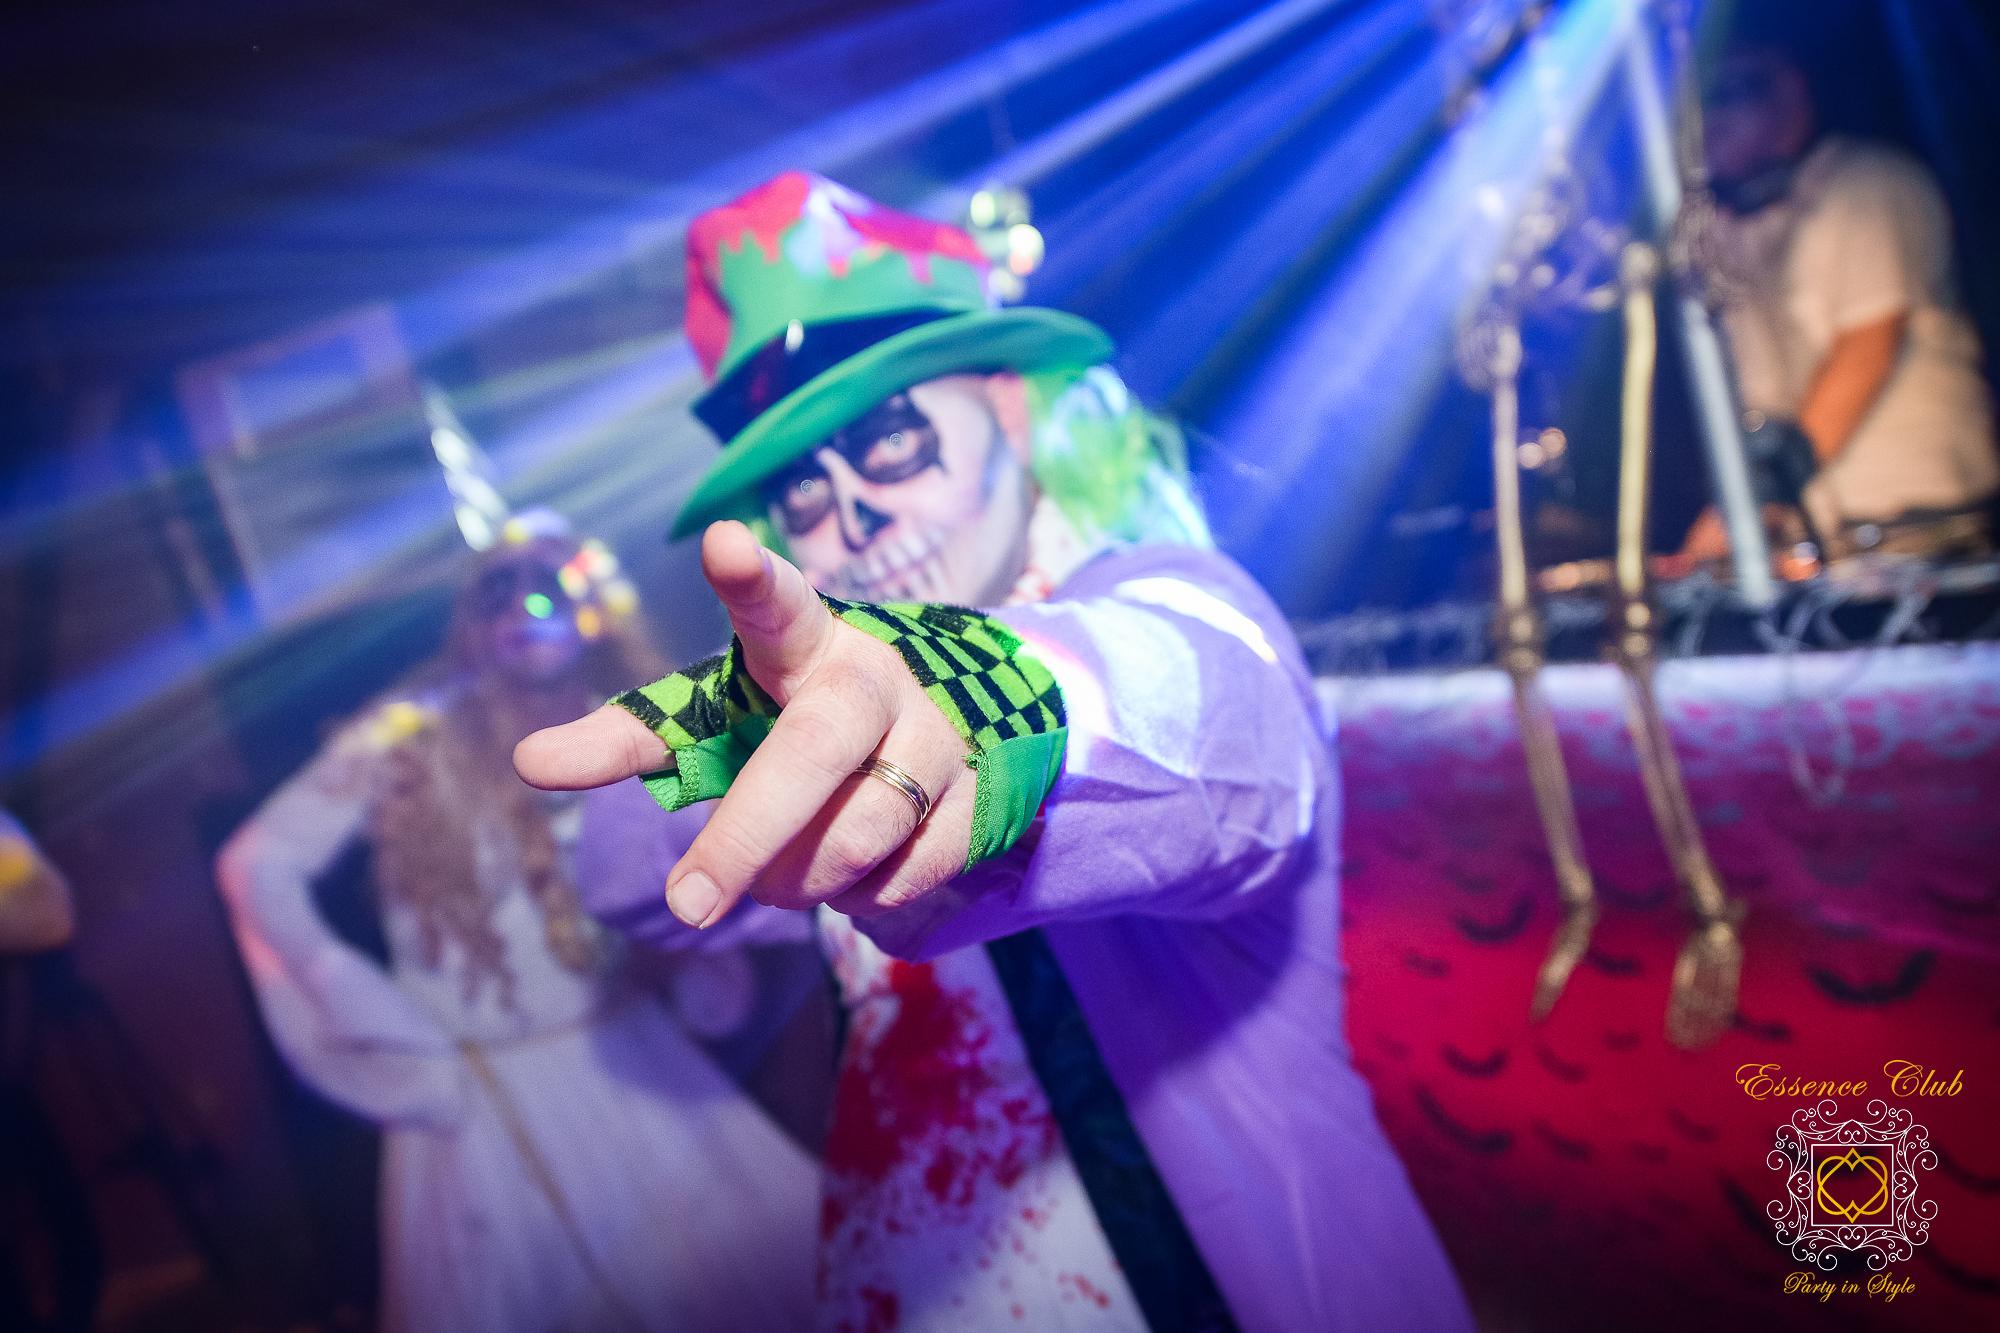 Essence club halloween blur